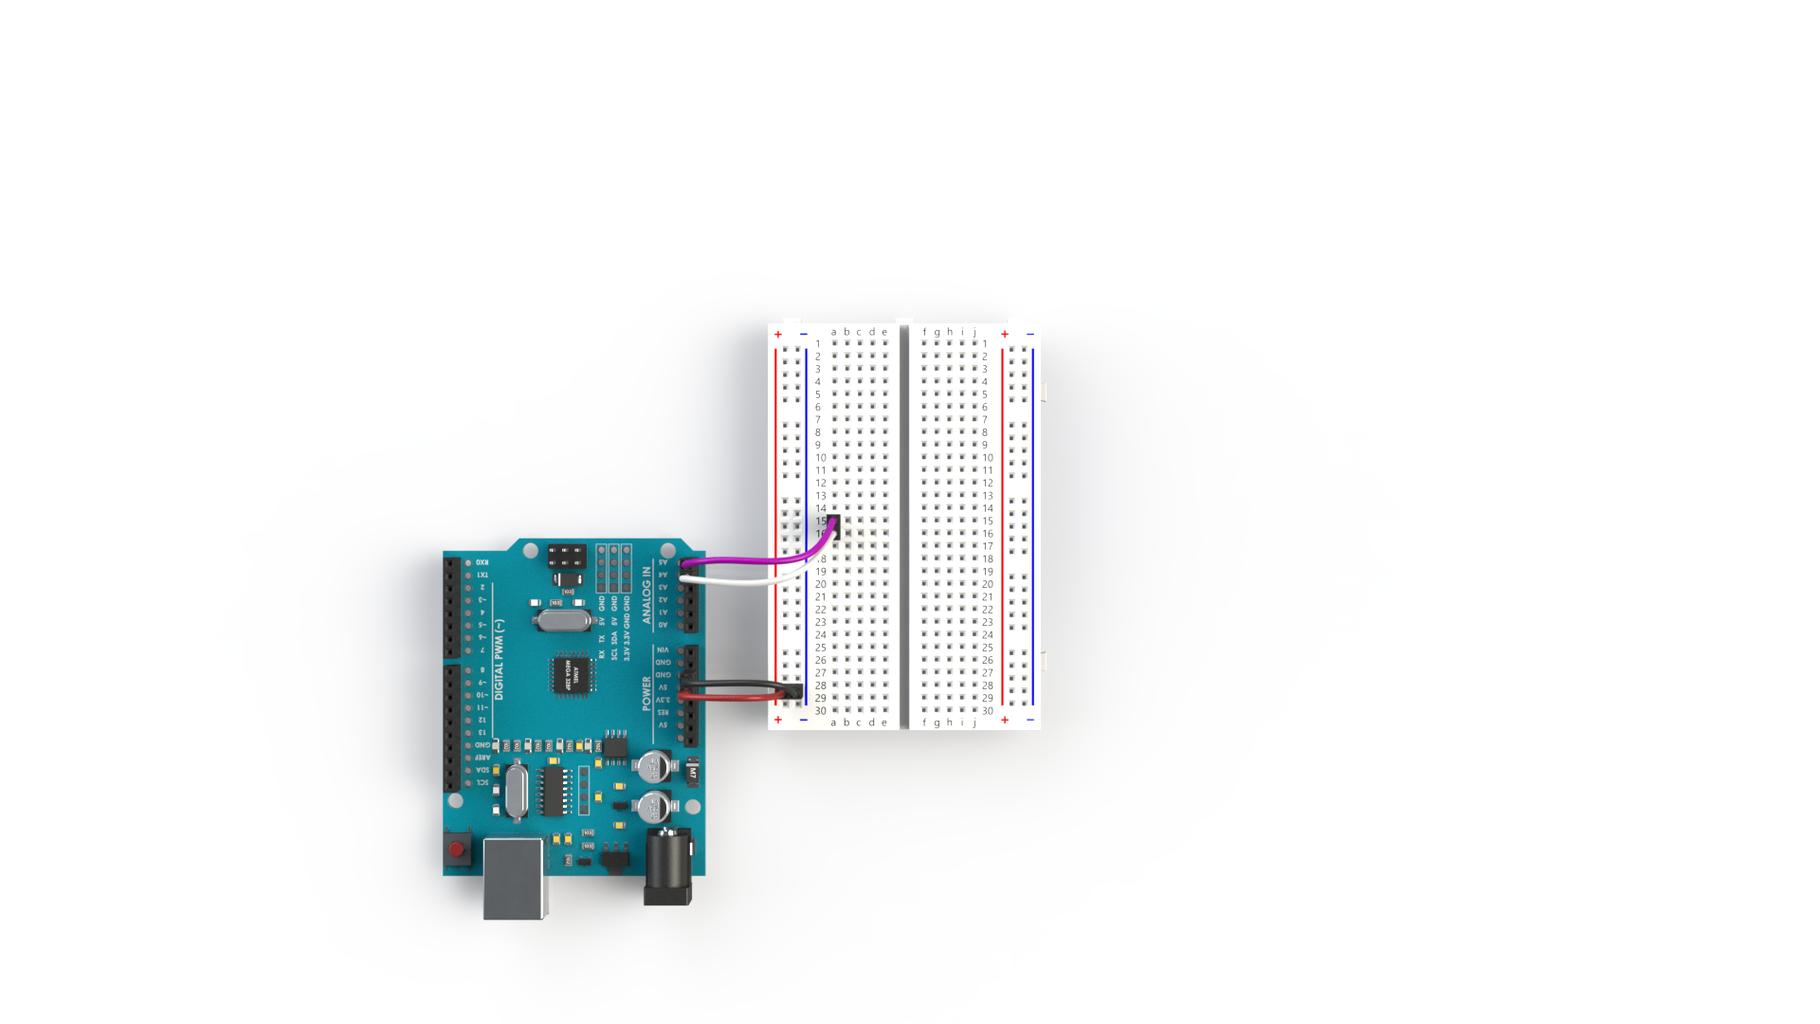 I2C Wiring of Three Arduinos